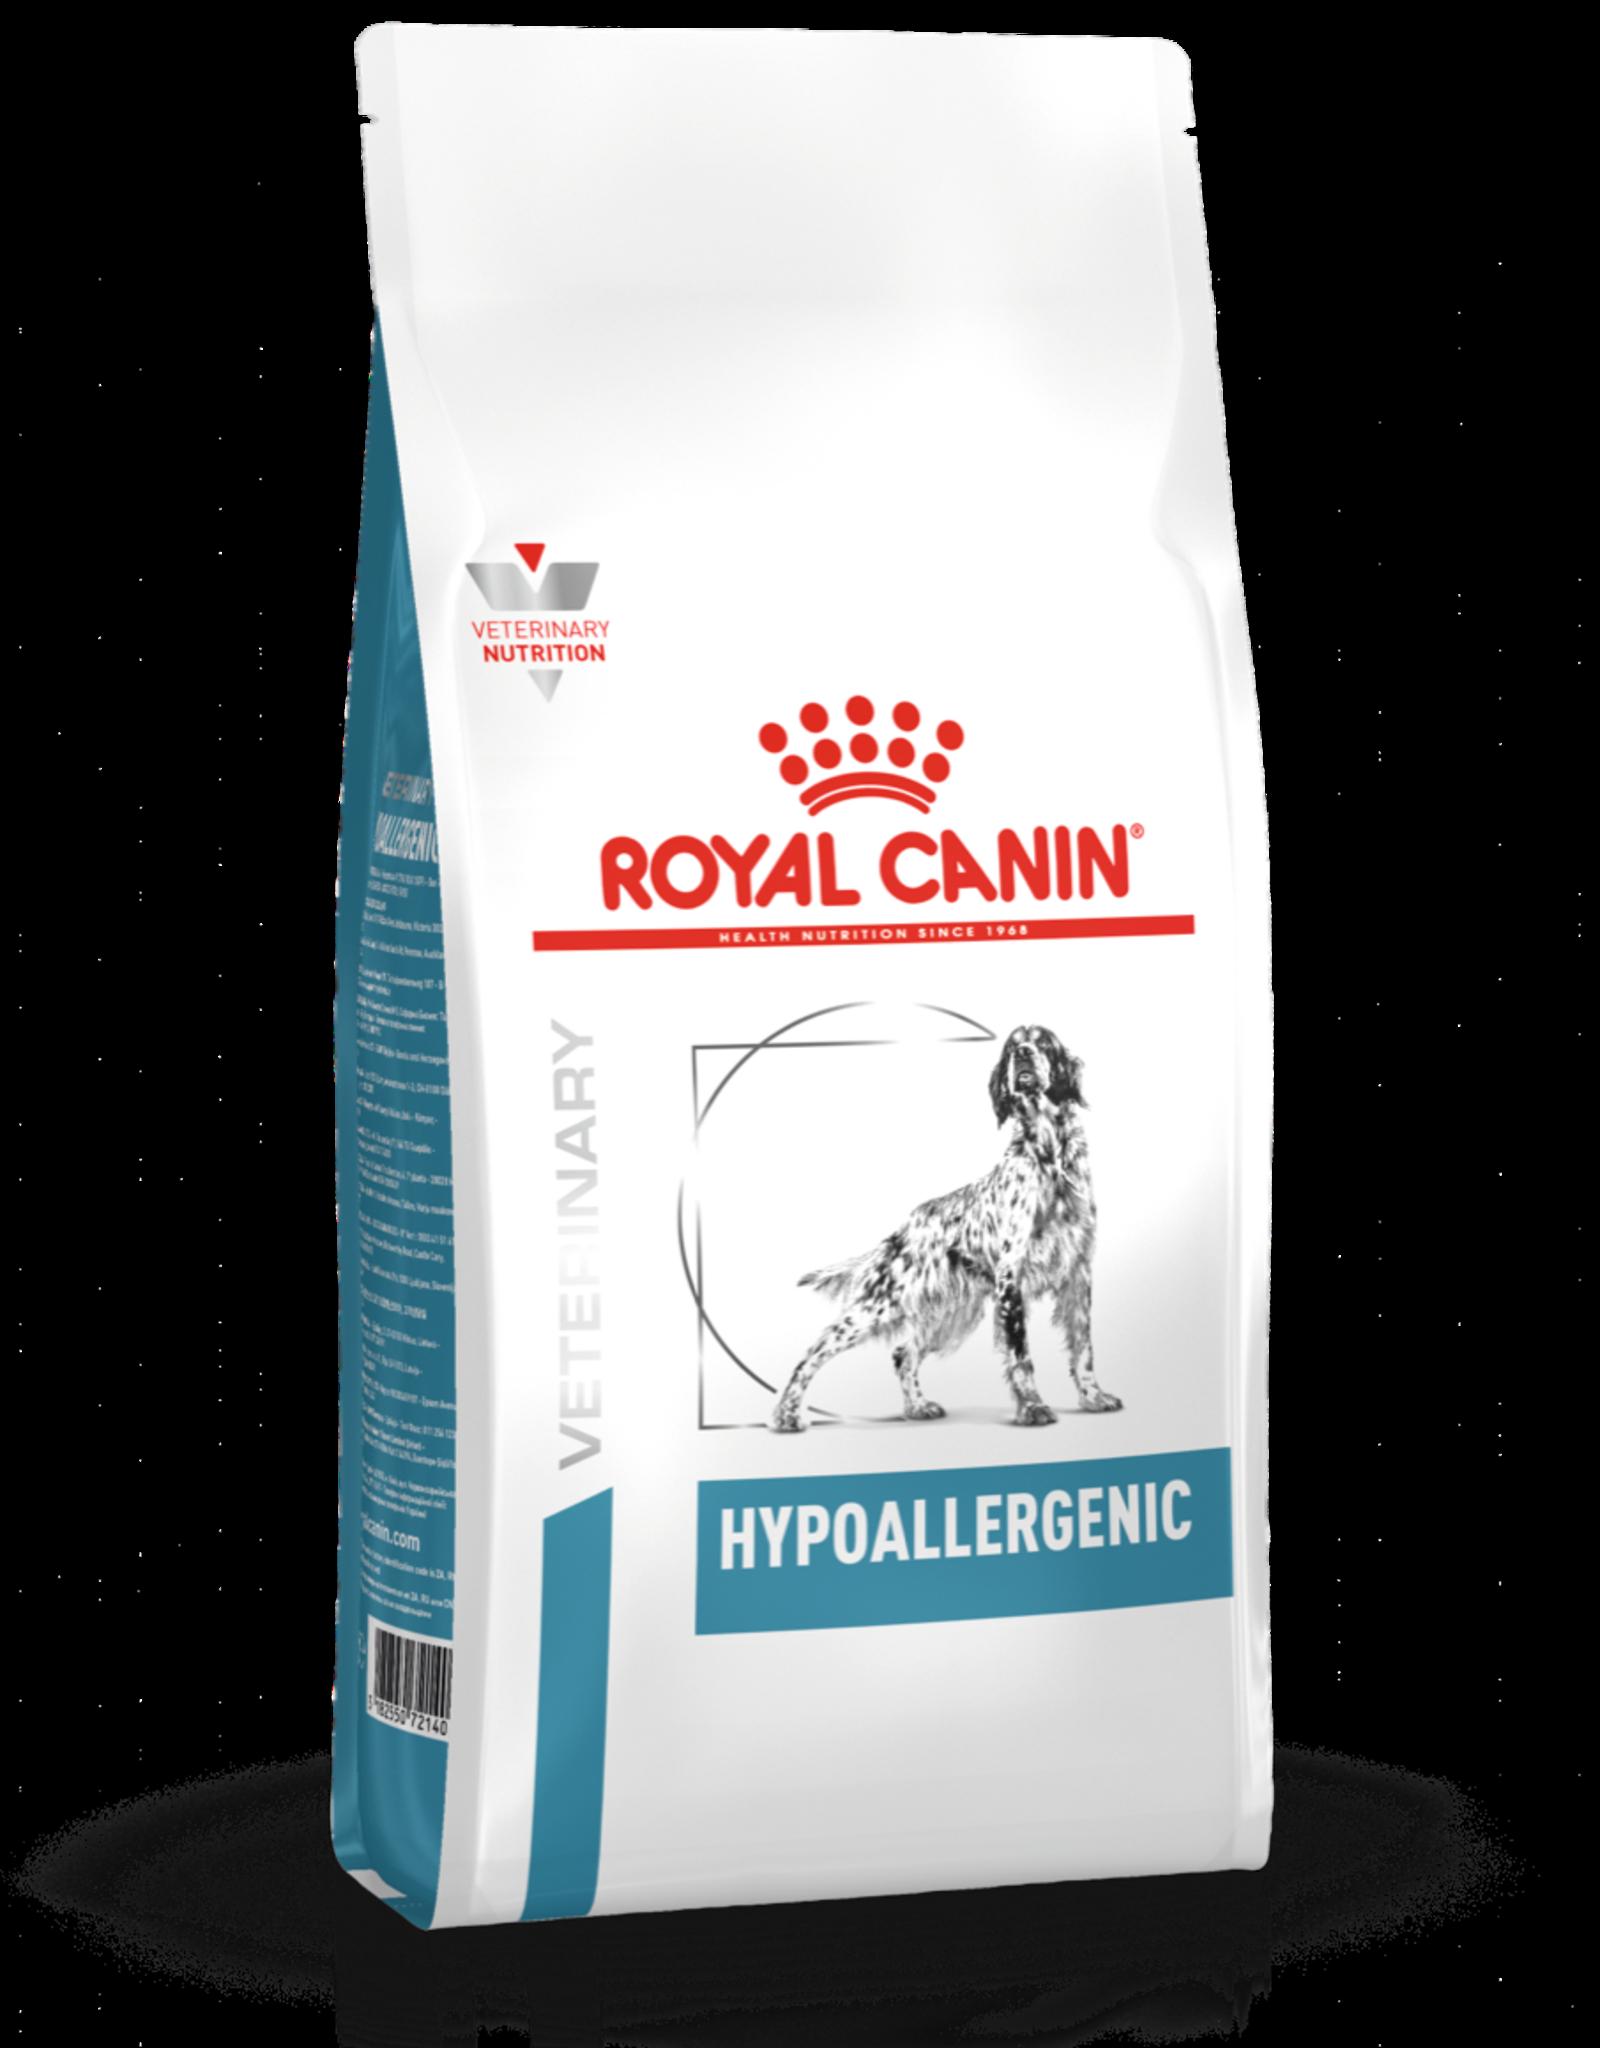 Royal Canin Royal Canin Hypoallergenic Hond 14kg hondenvoer